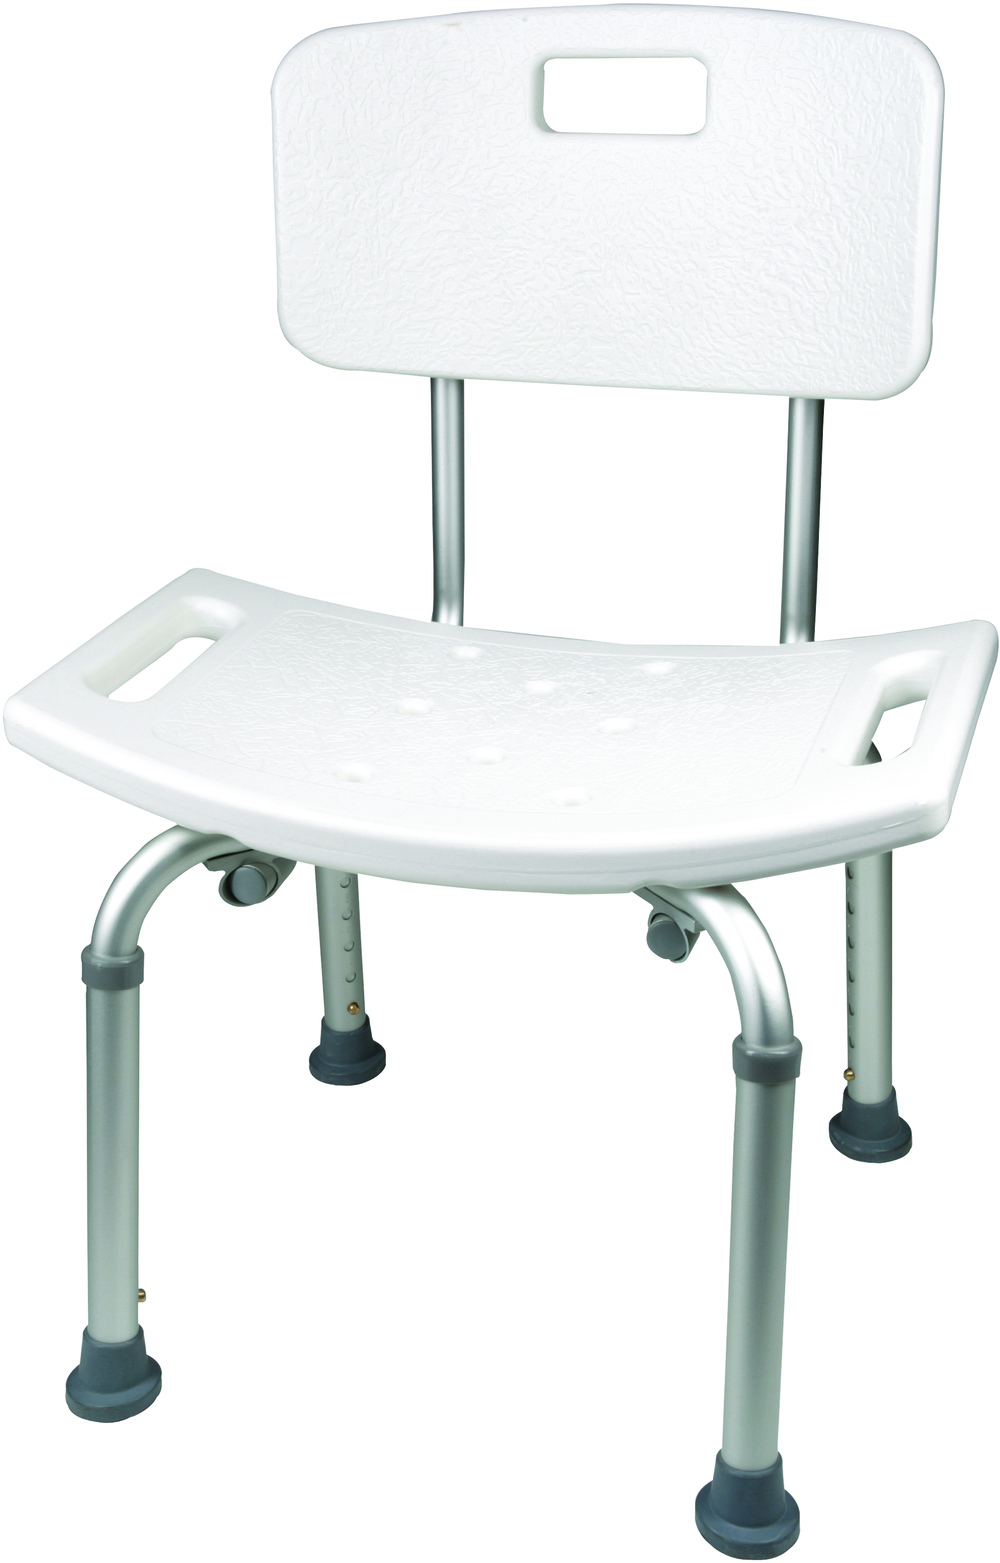 Cardinal Health Cardinal Health Shower Chair Shower Chair - Adjustable shower chair